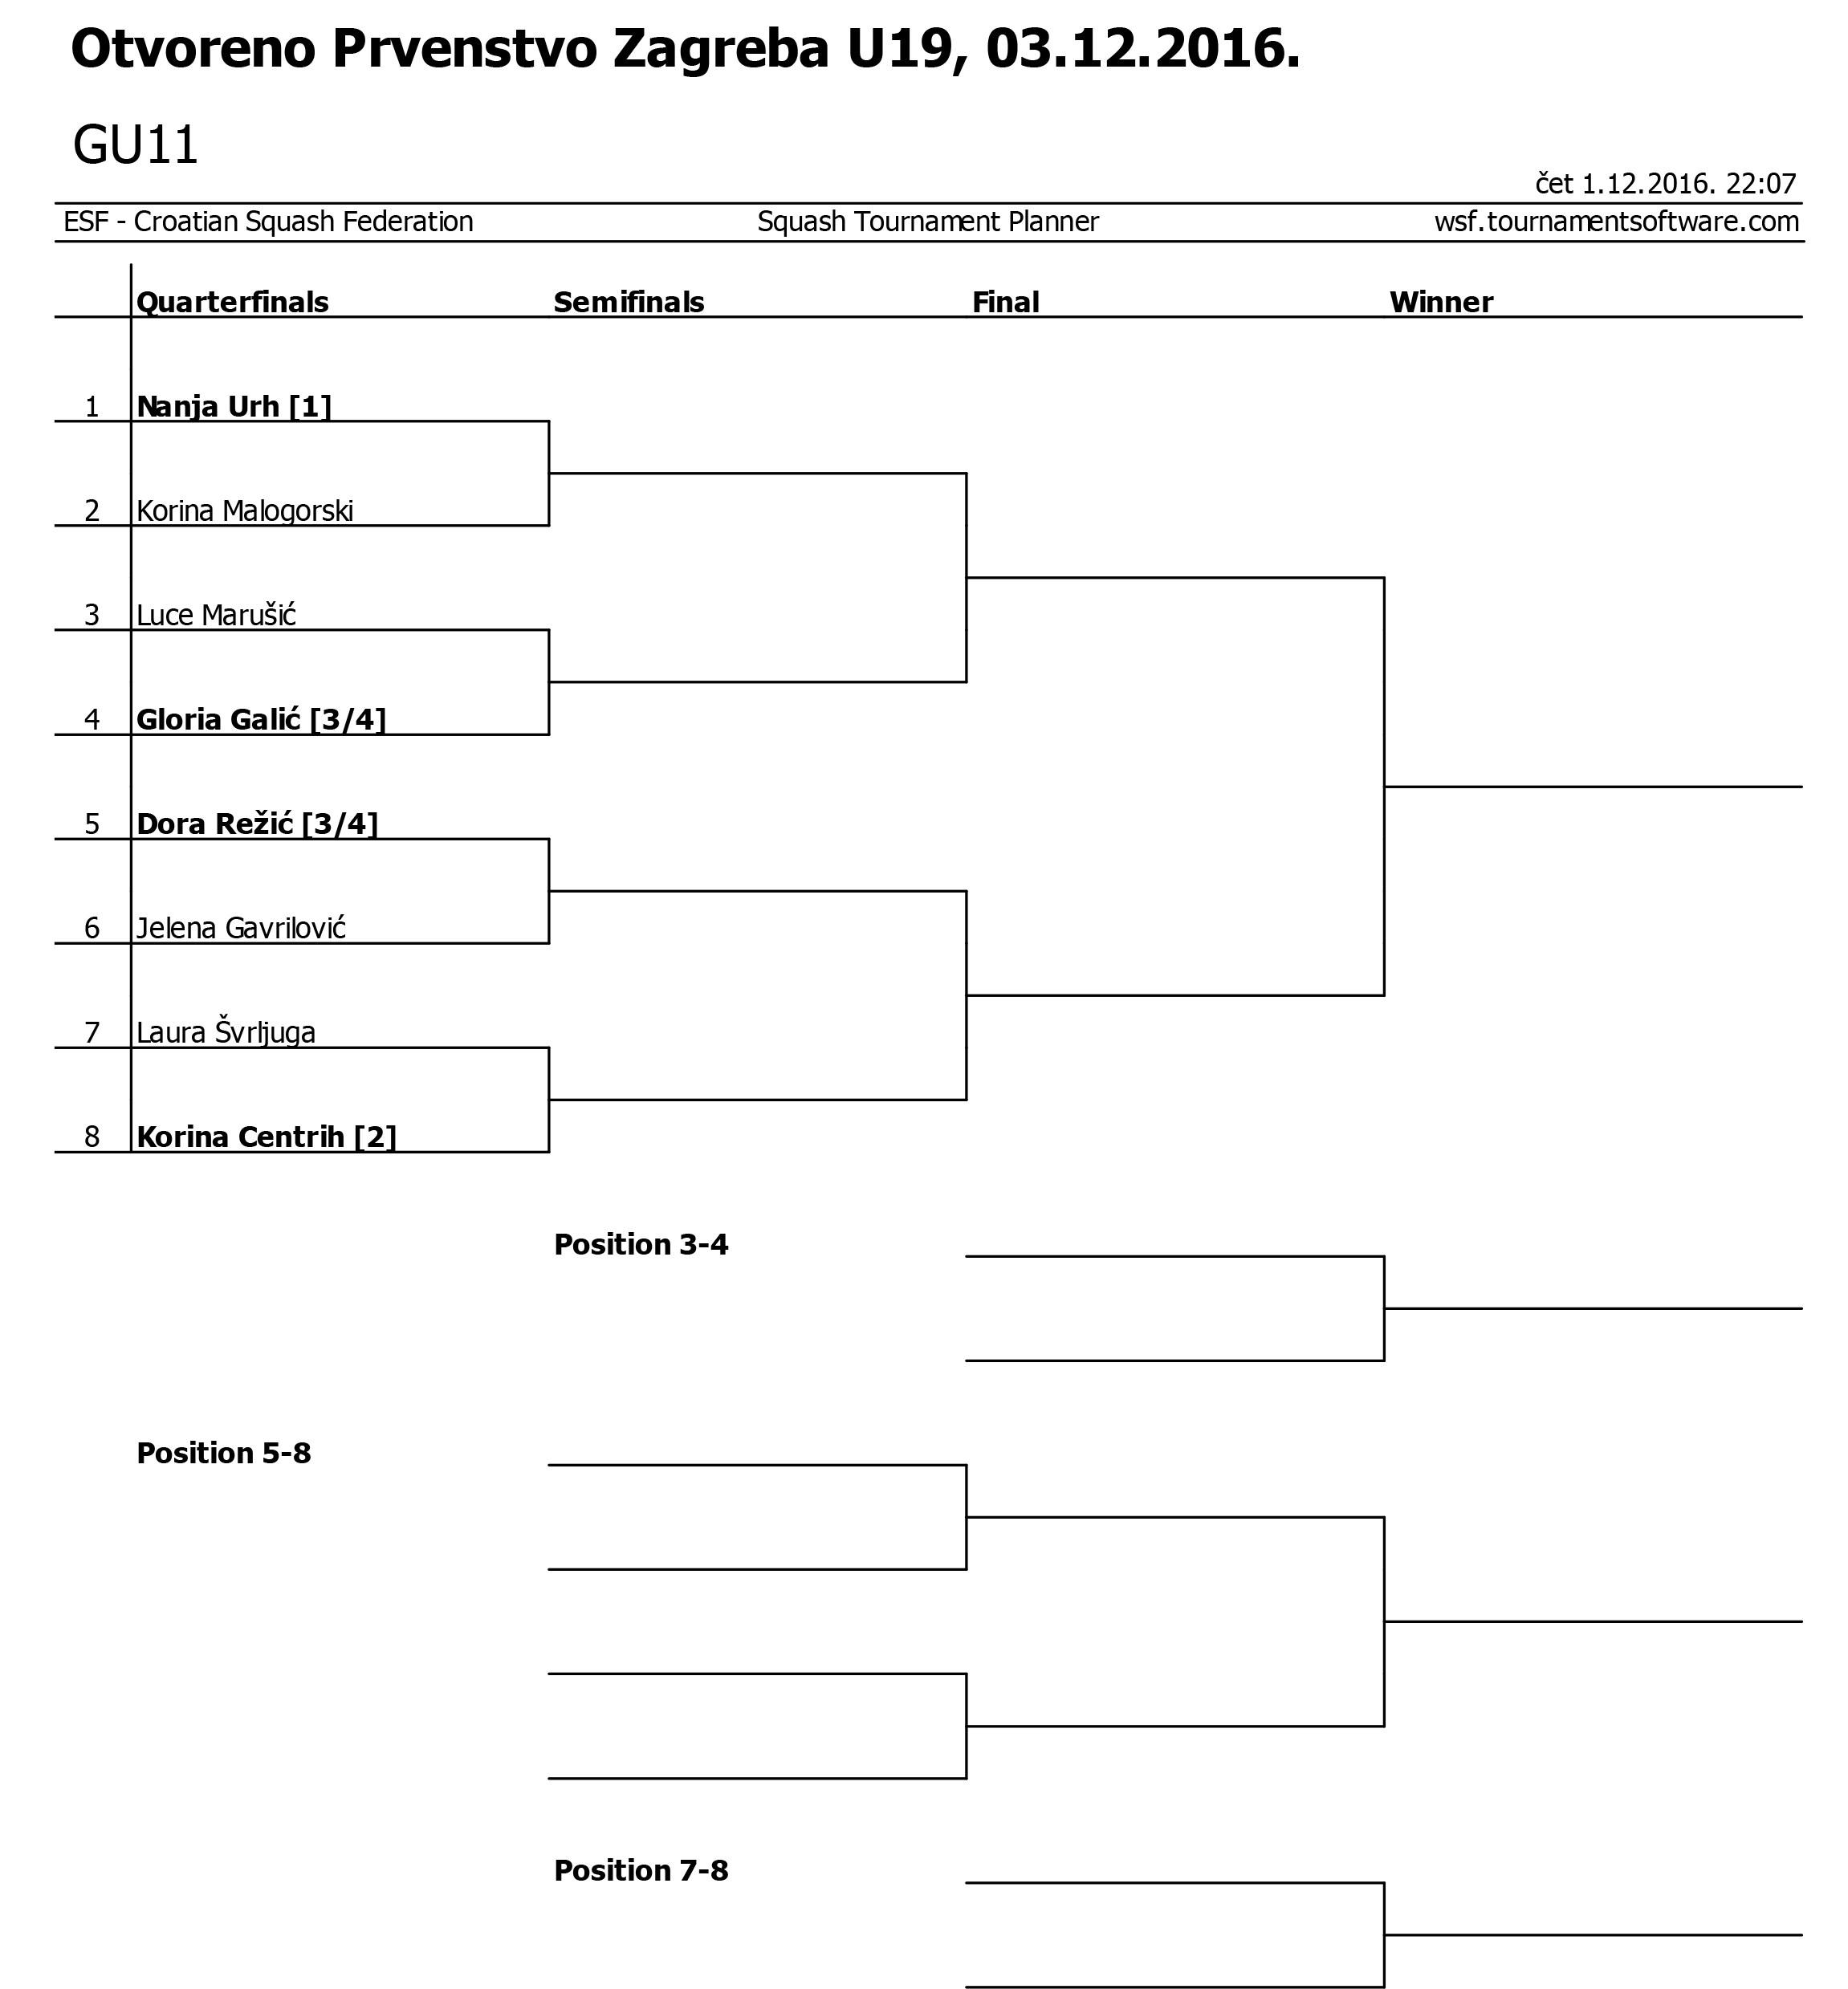 Squash Tournament Planner